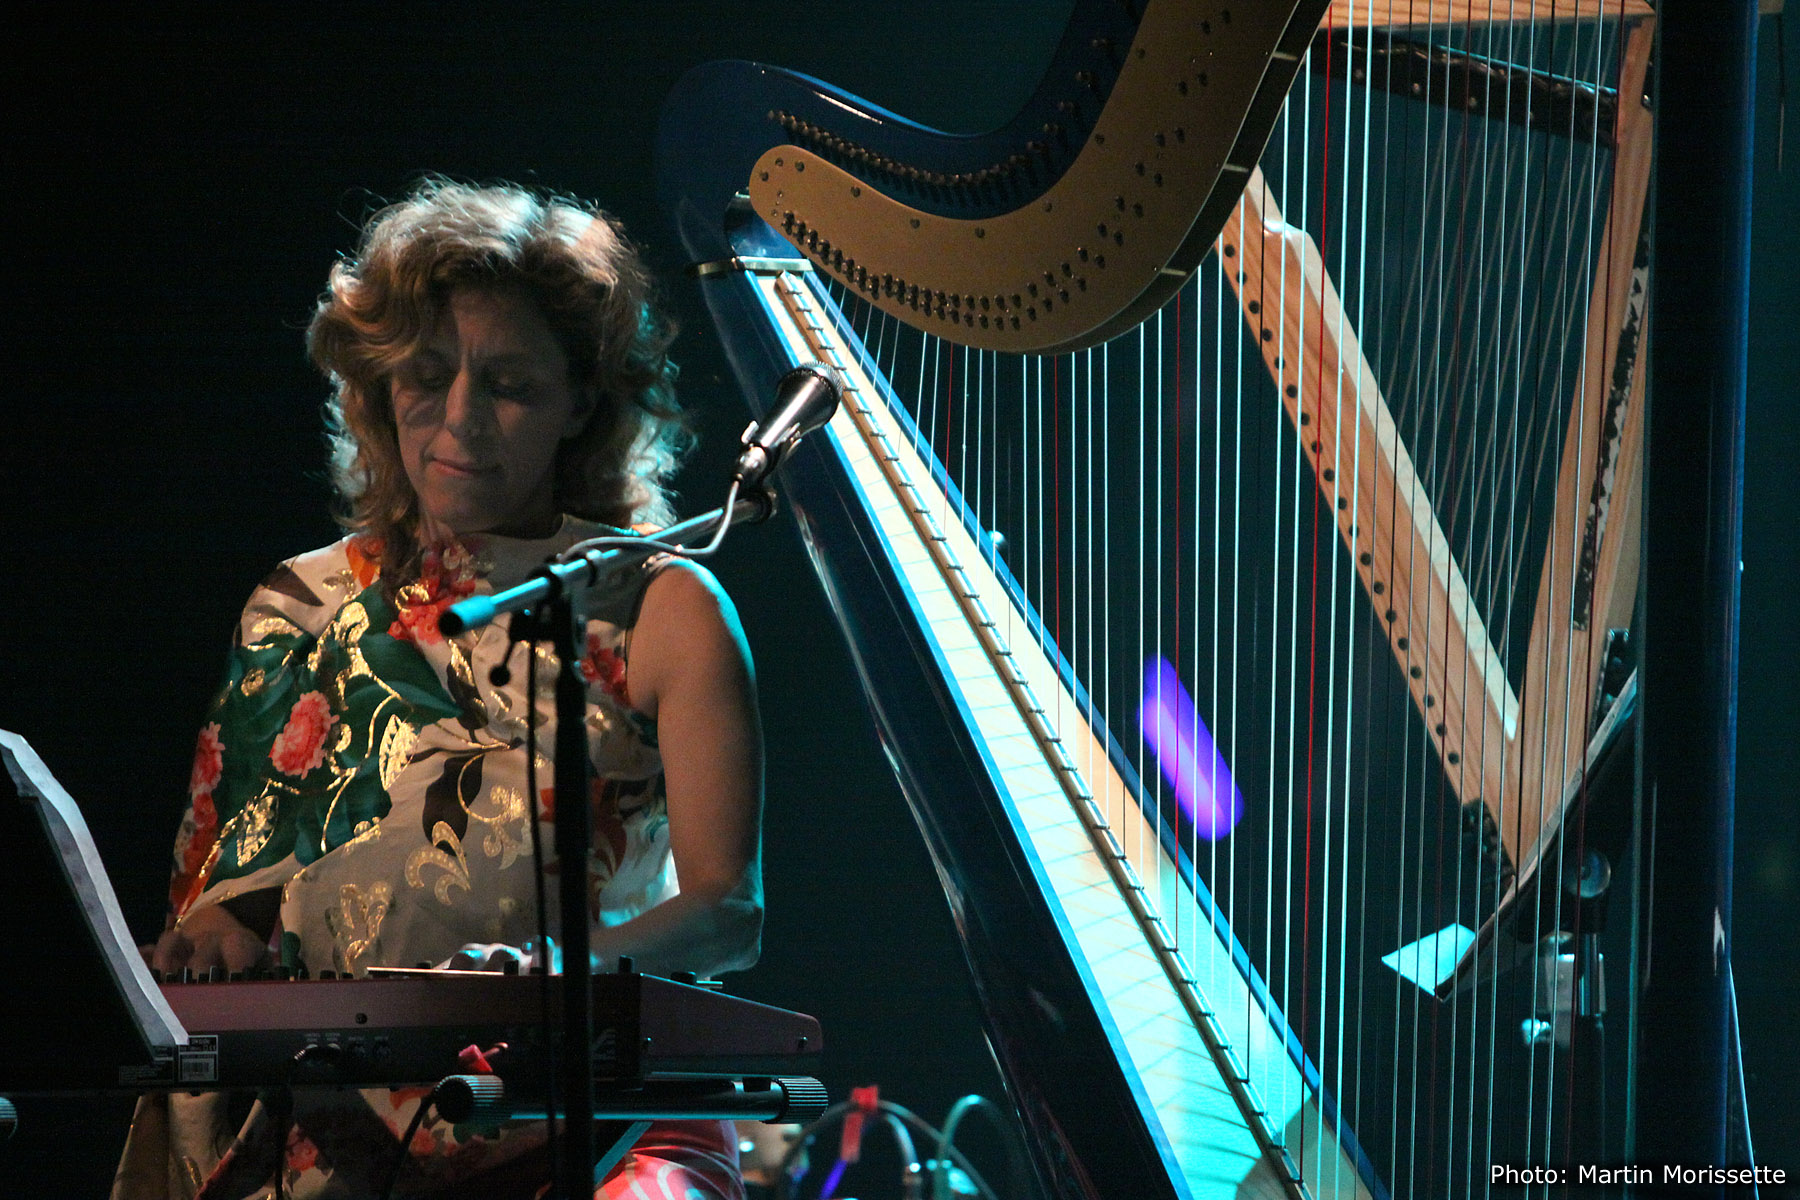 Zeena Parkins at Fimav 2011